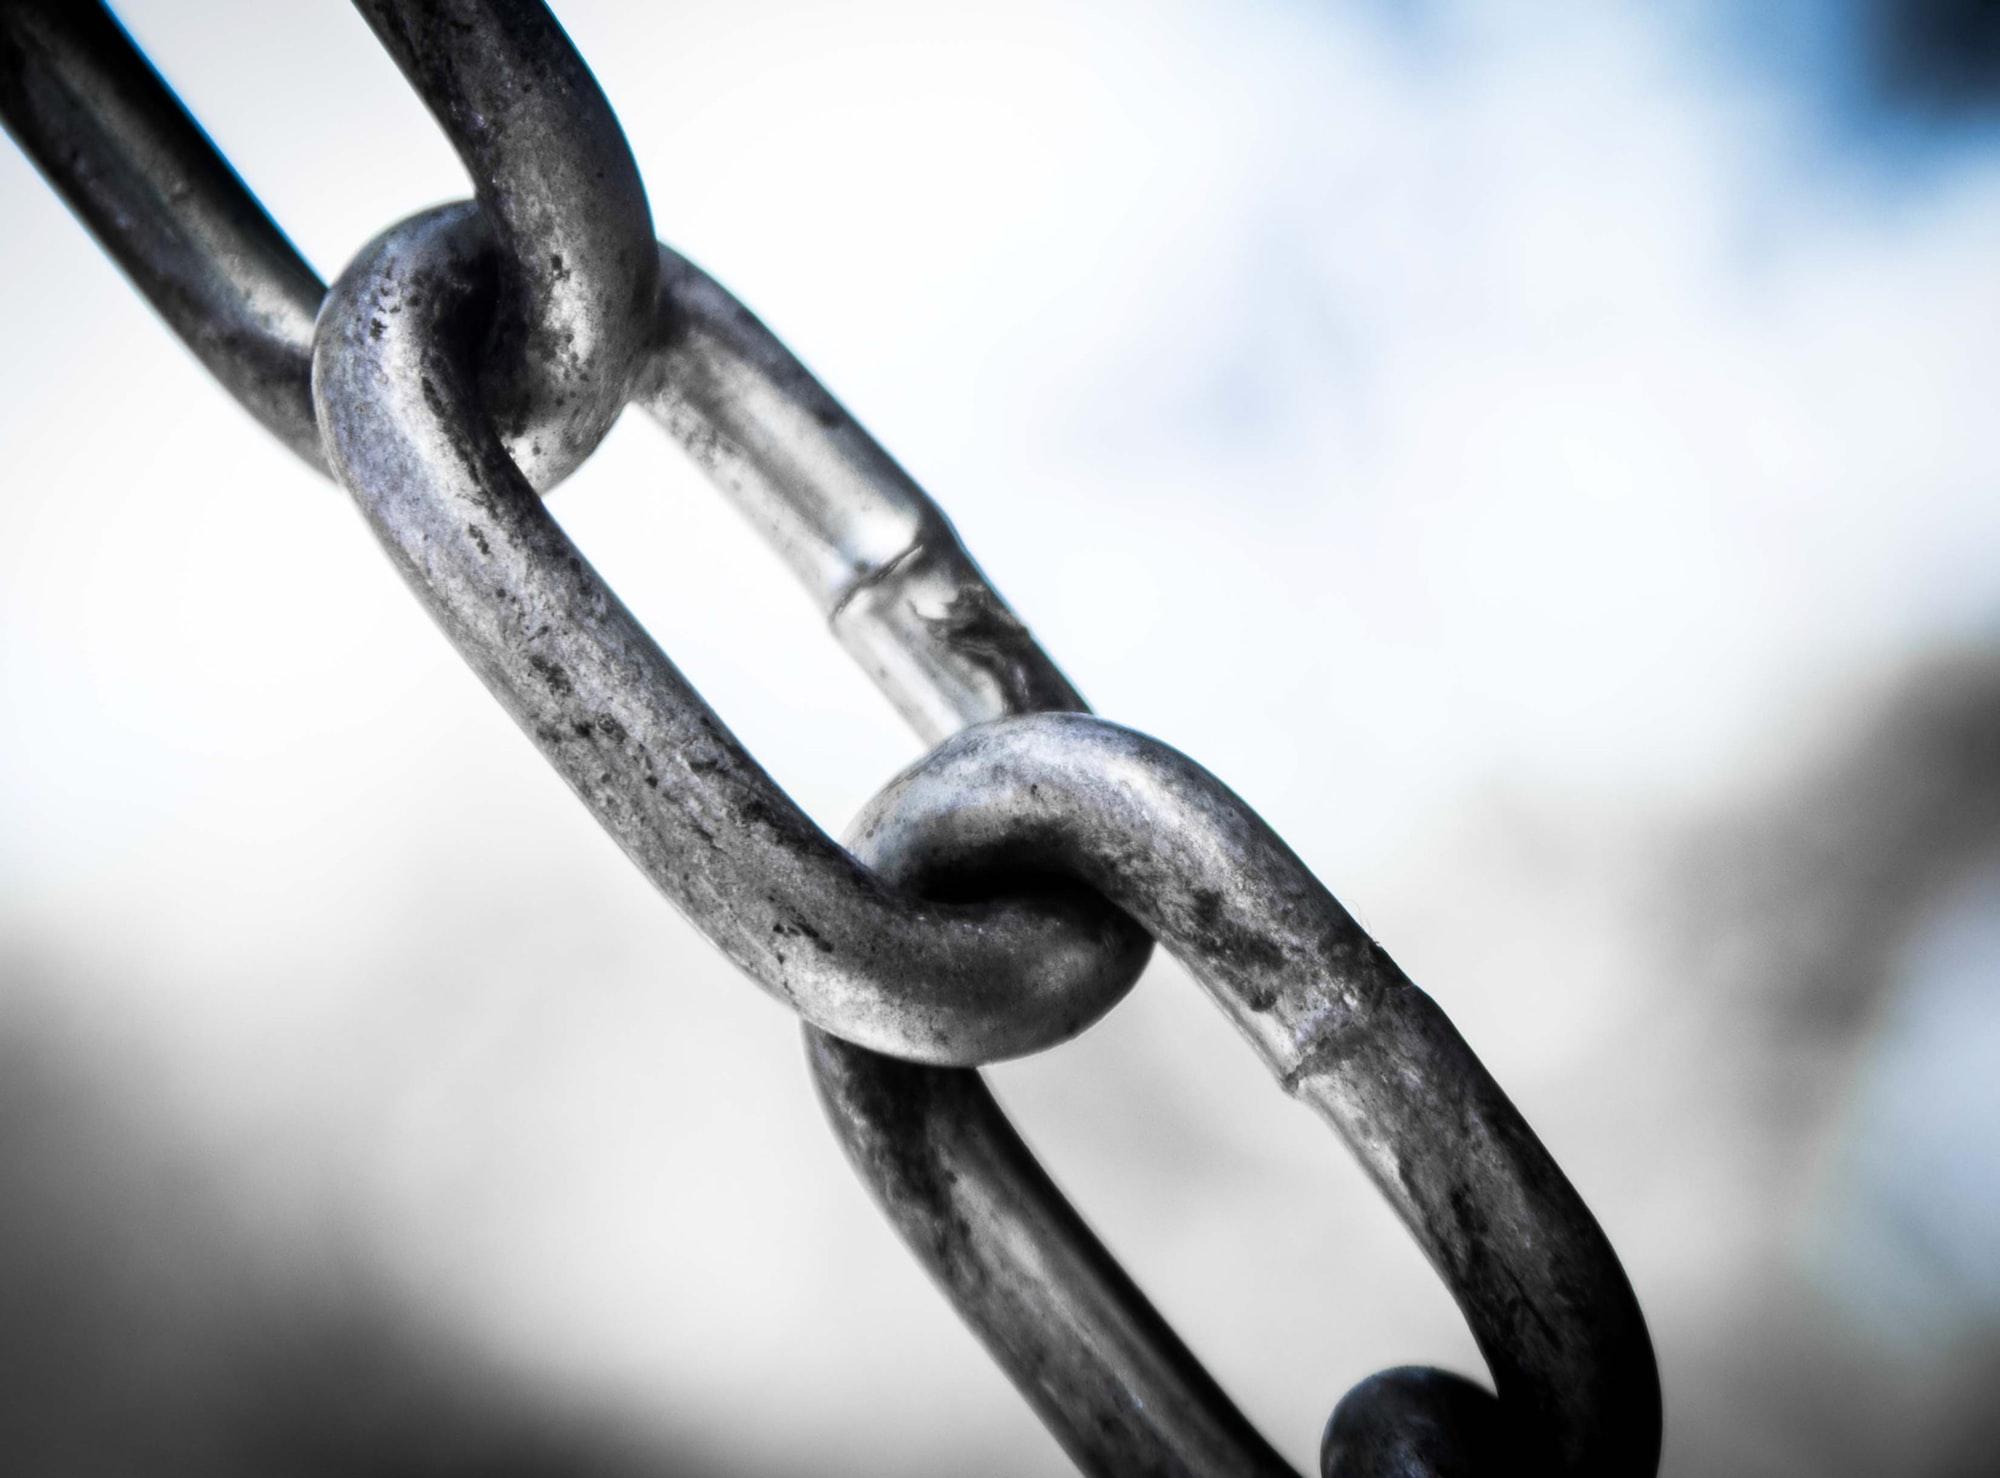 Chaining commands/methods in Typescript